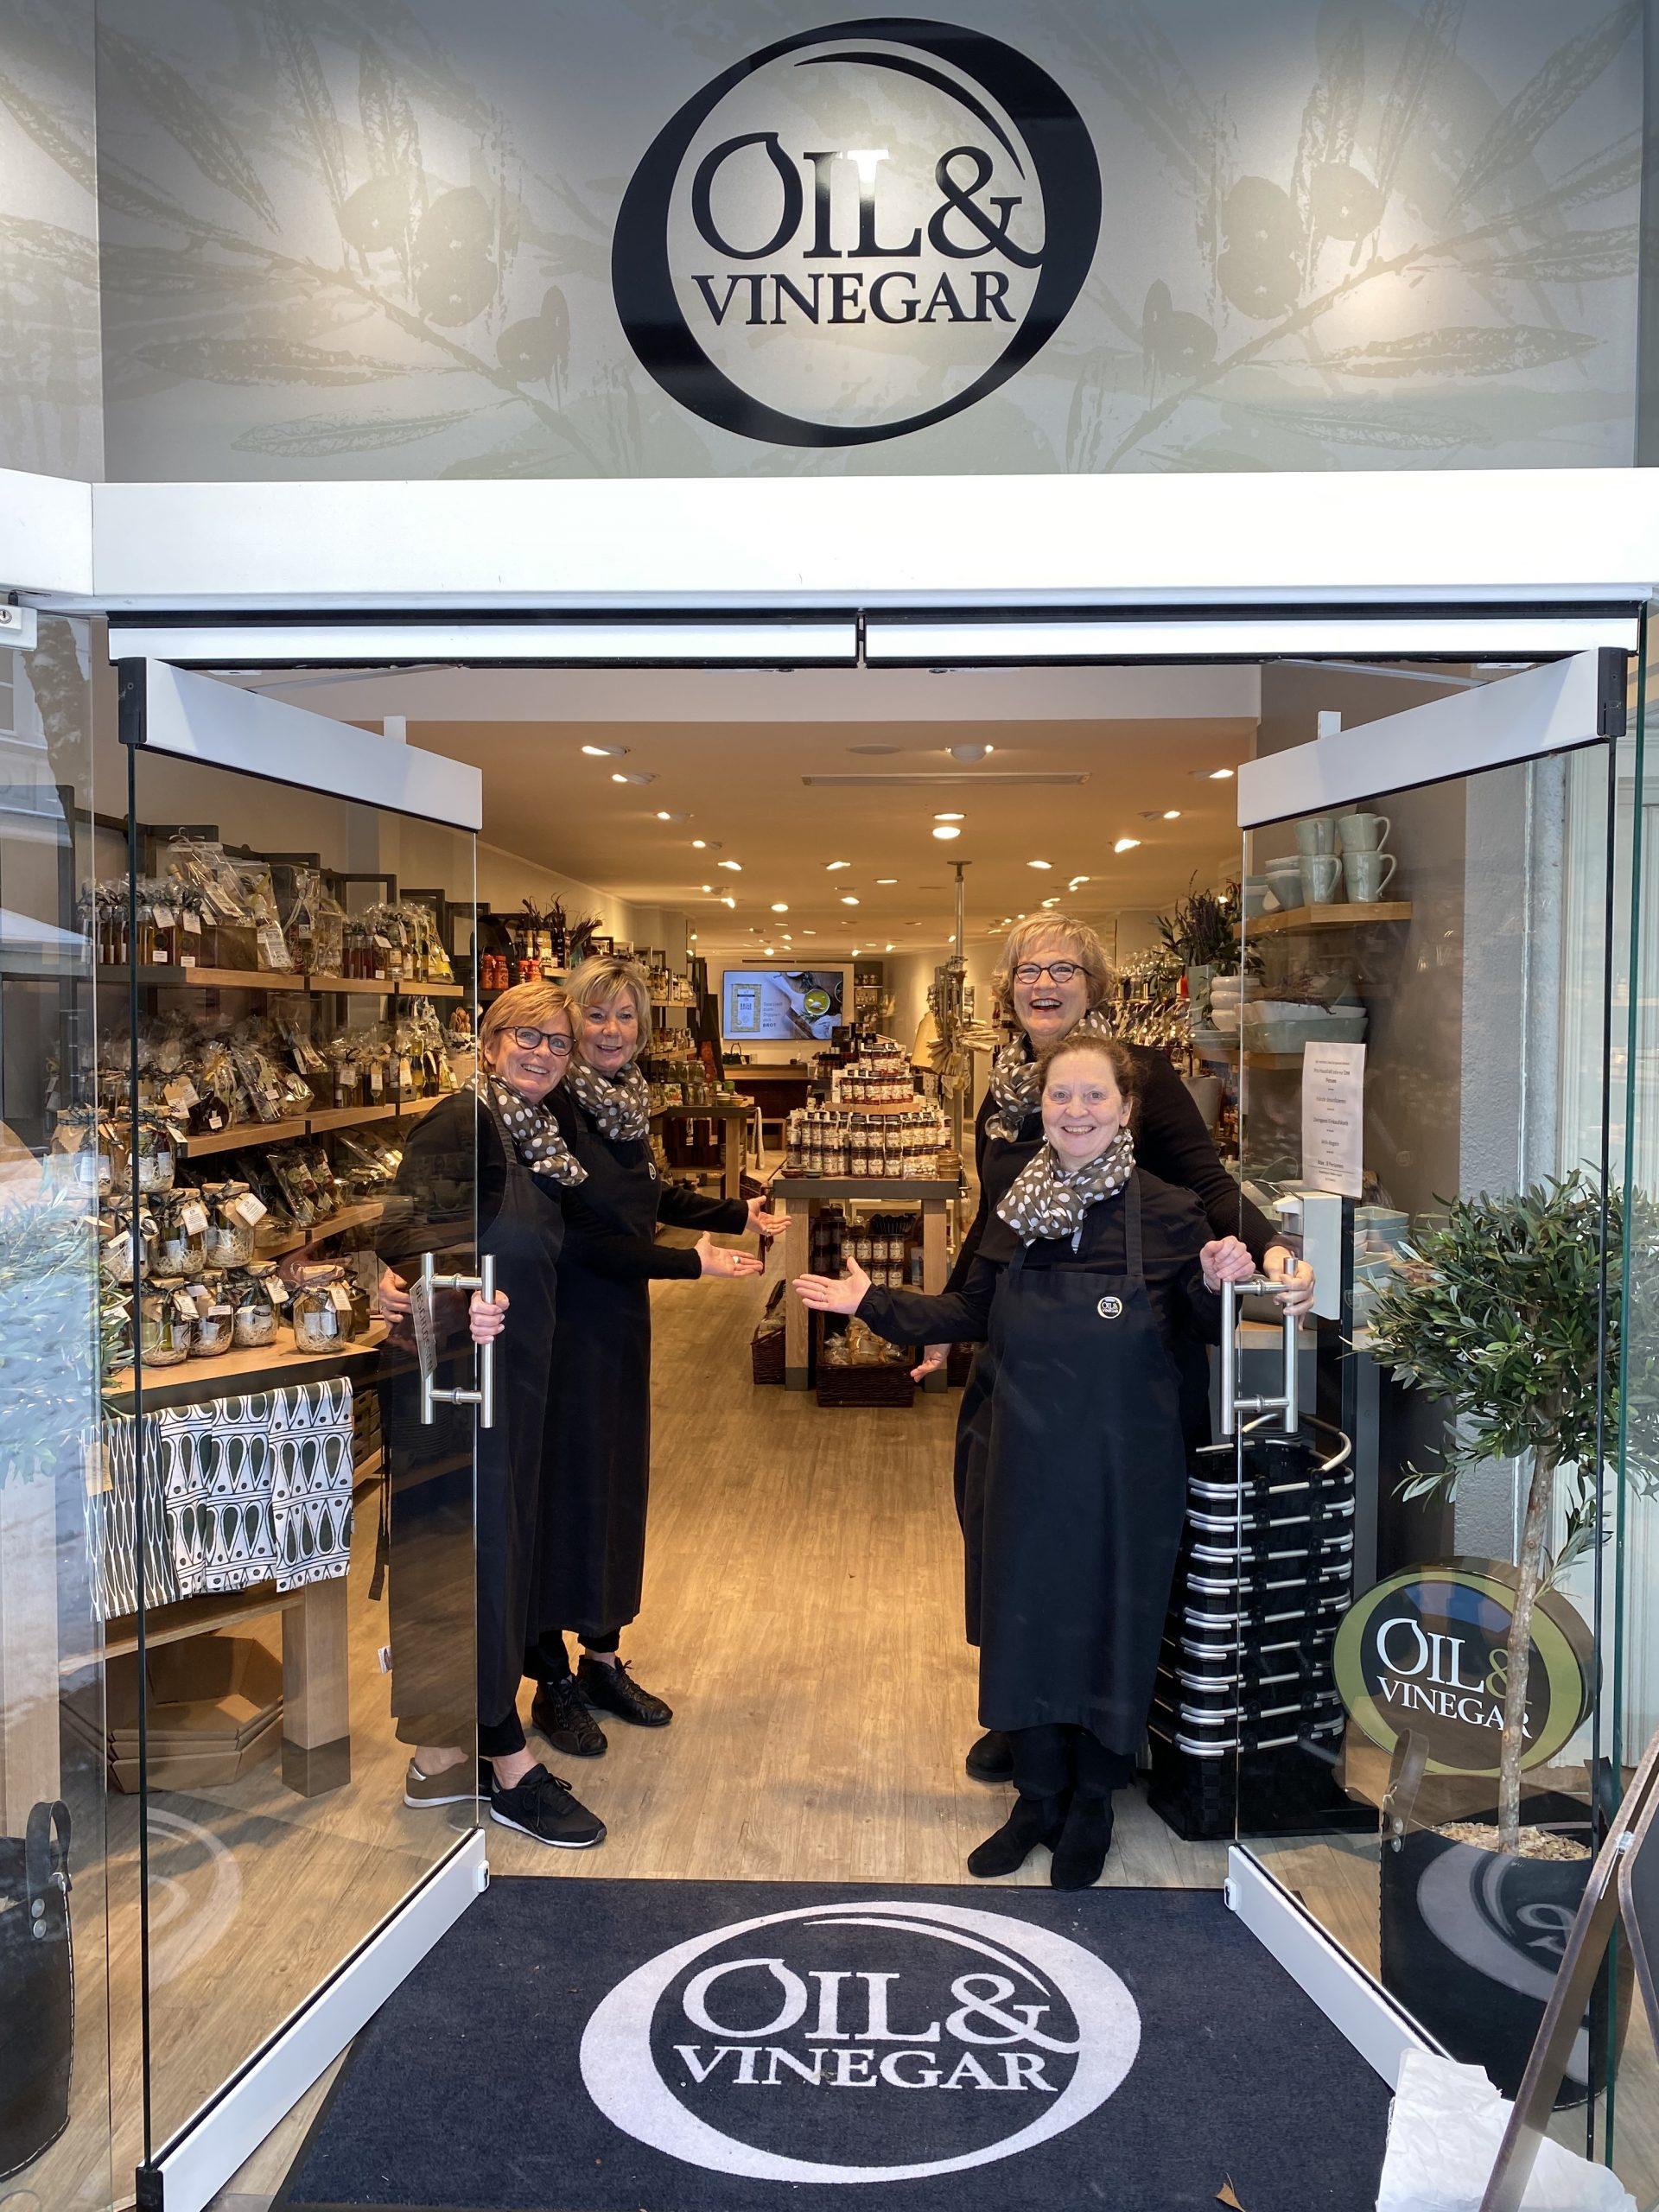 Neuer Shop in Kempen